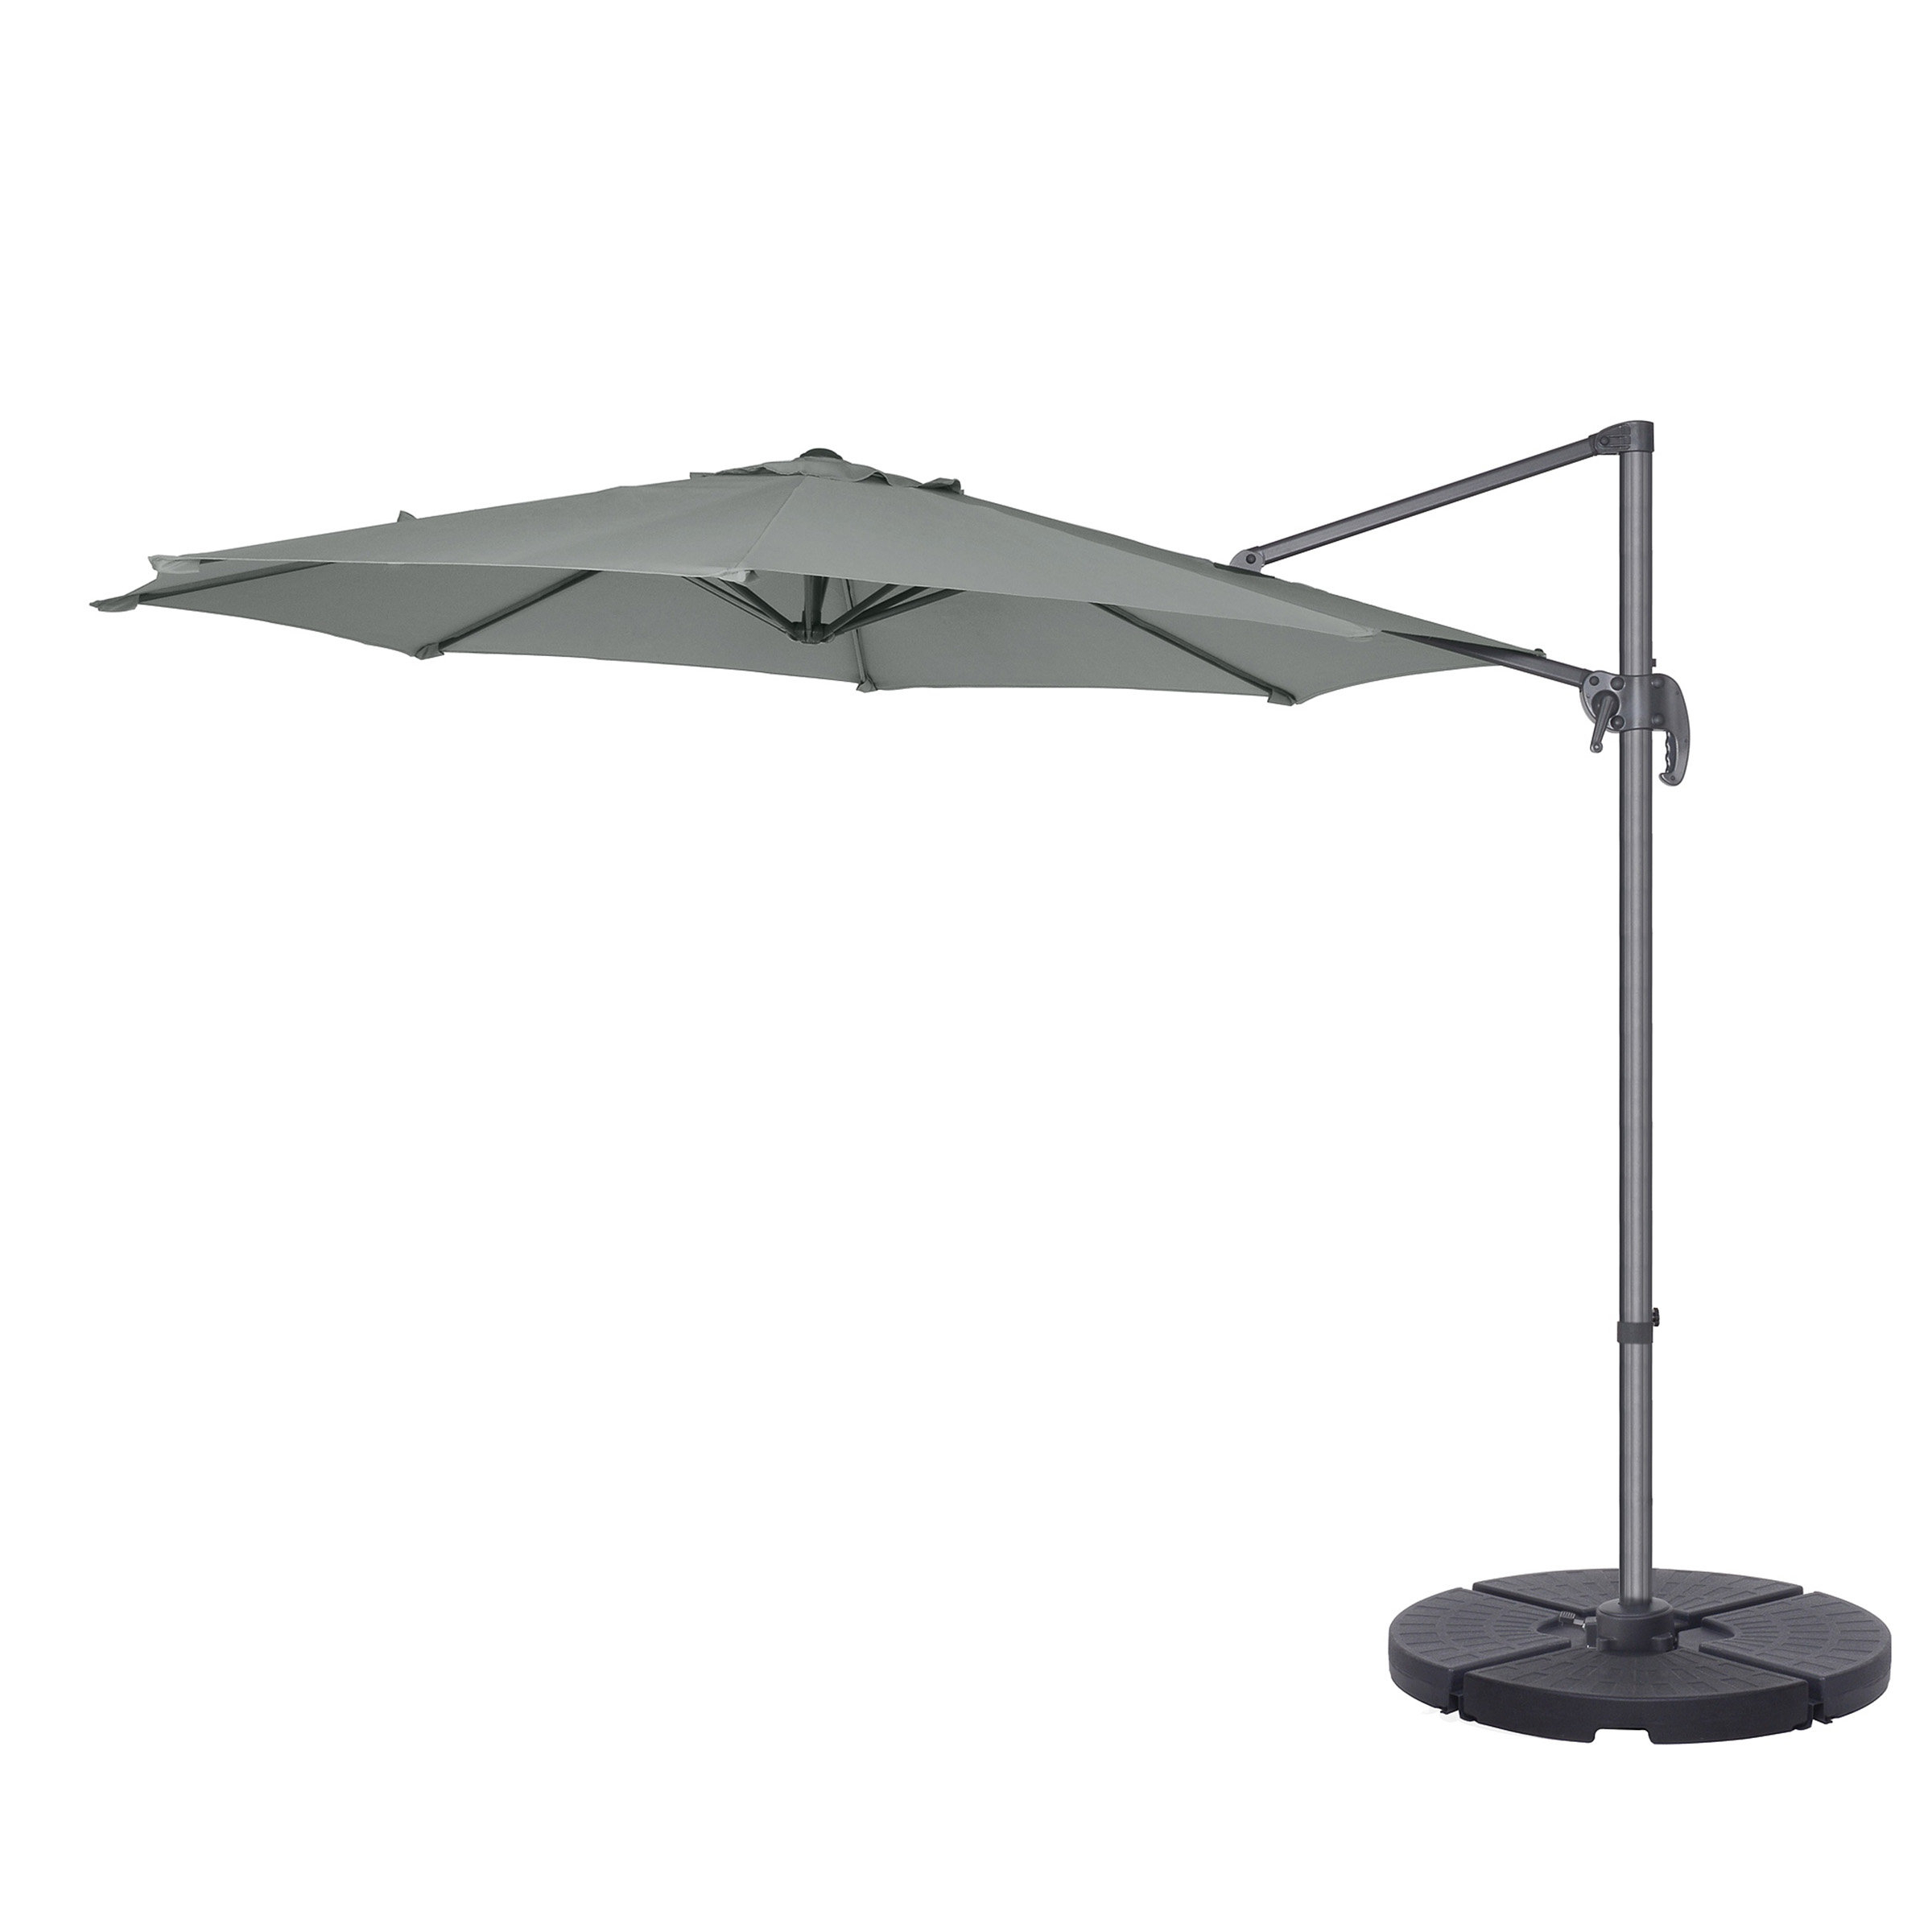 Most Recent Ryant Cantilever Umbrellas Regarding Cockermouth Rotating 10' Cantilever Umbrella (View 10 of 20)